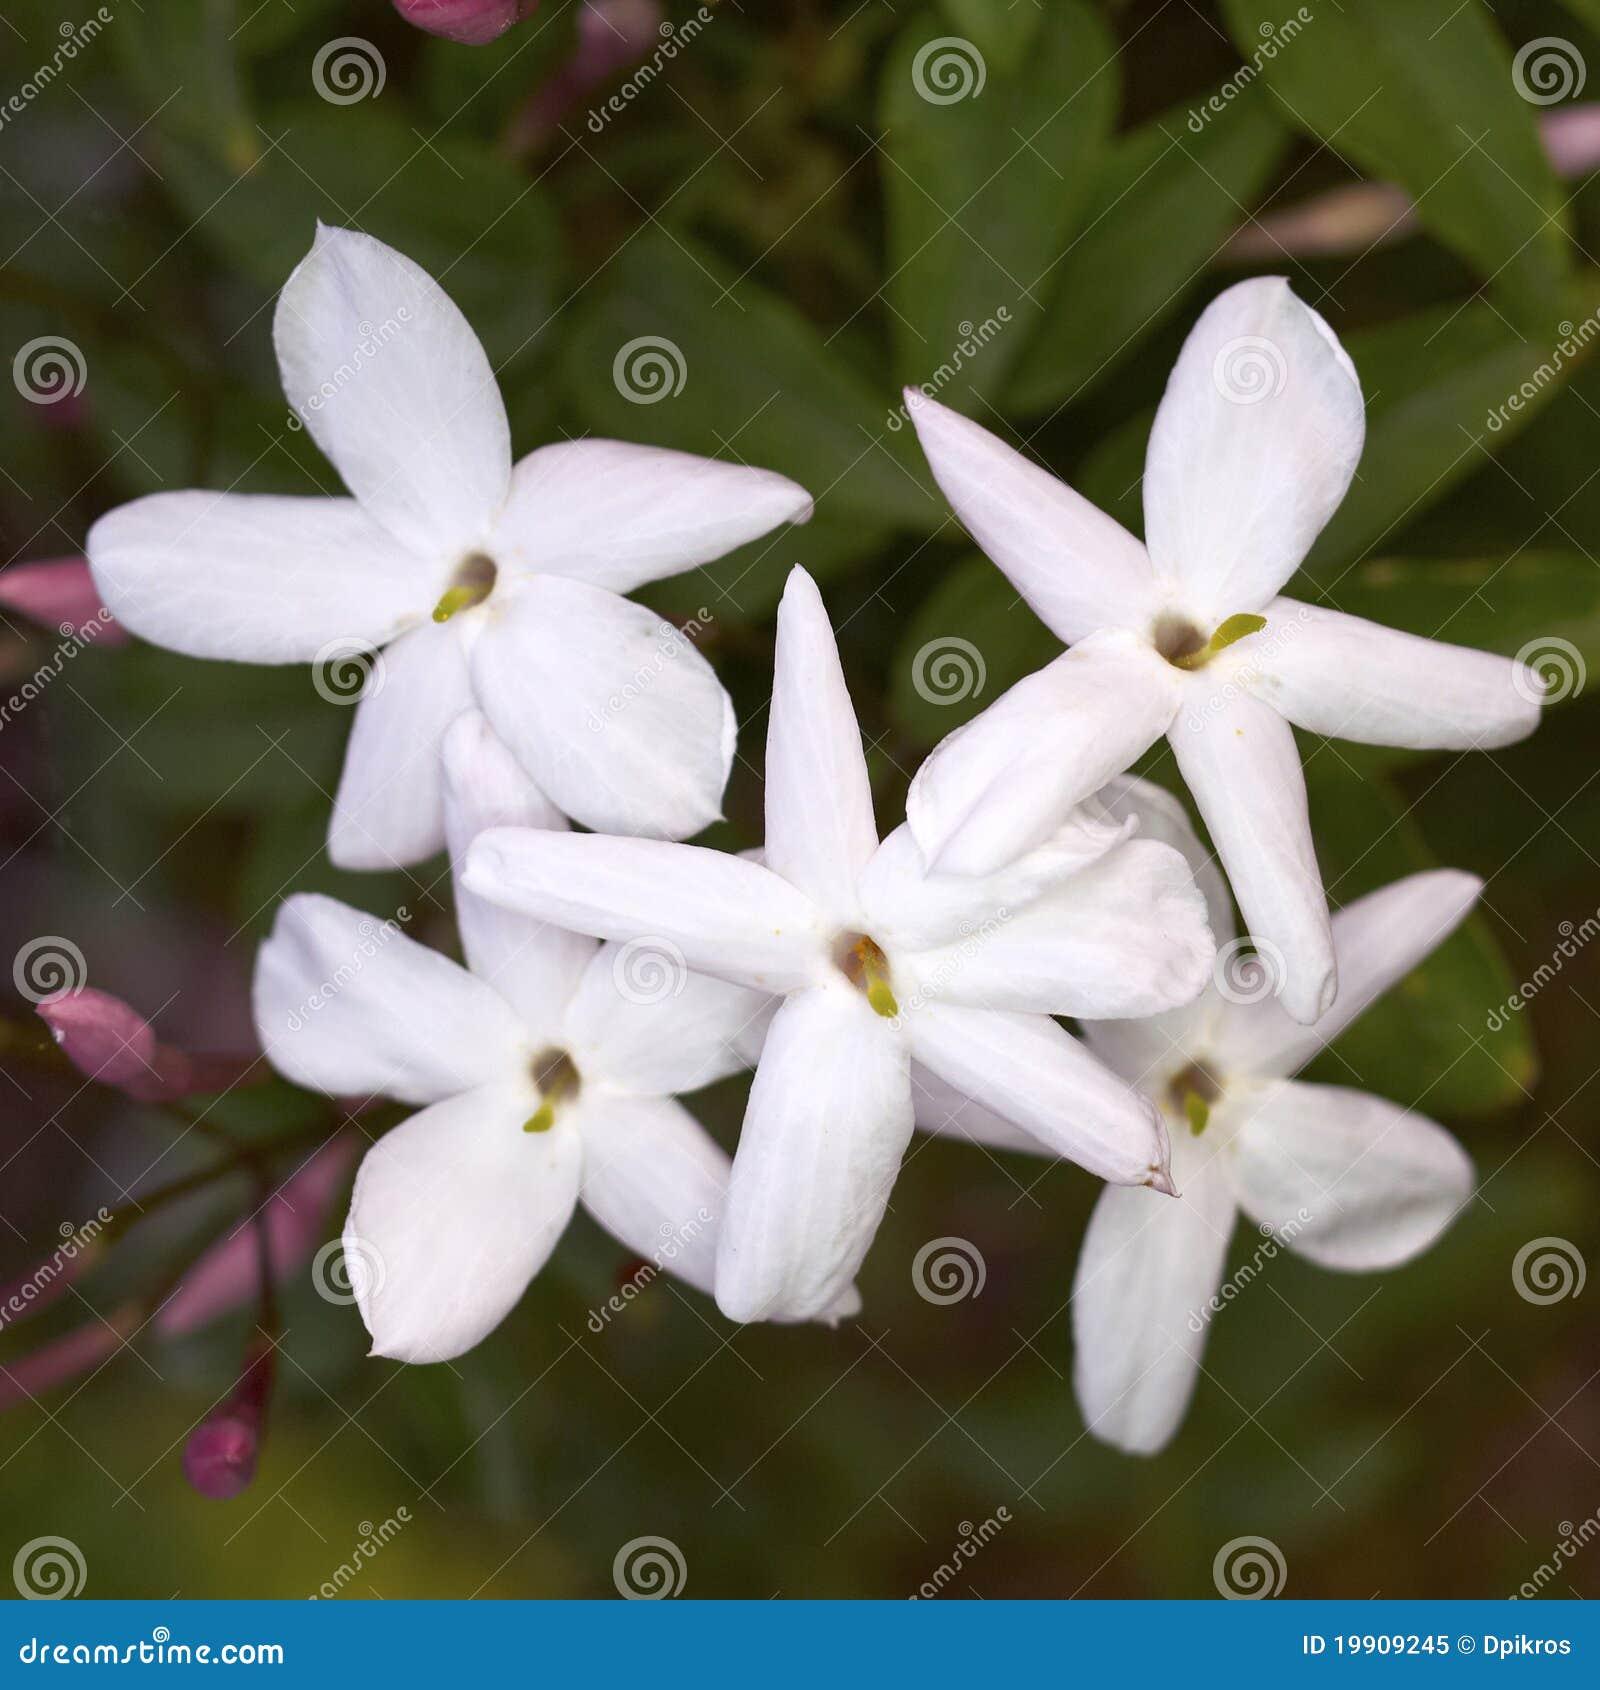 Jasmine Flower Bunch Stock Images Download 3567 Photos